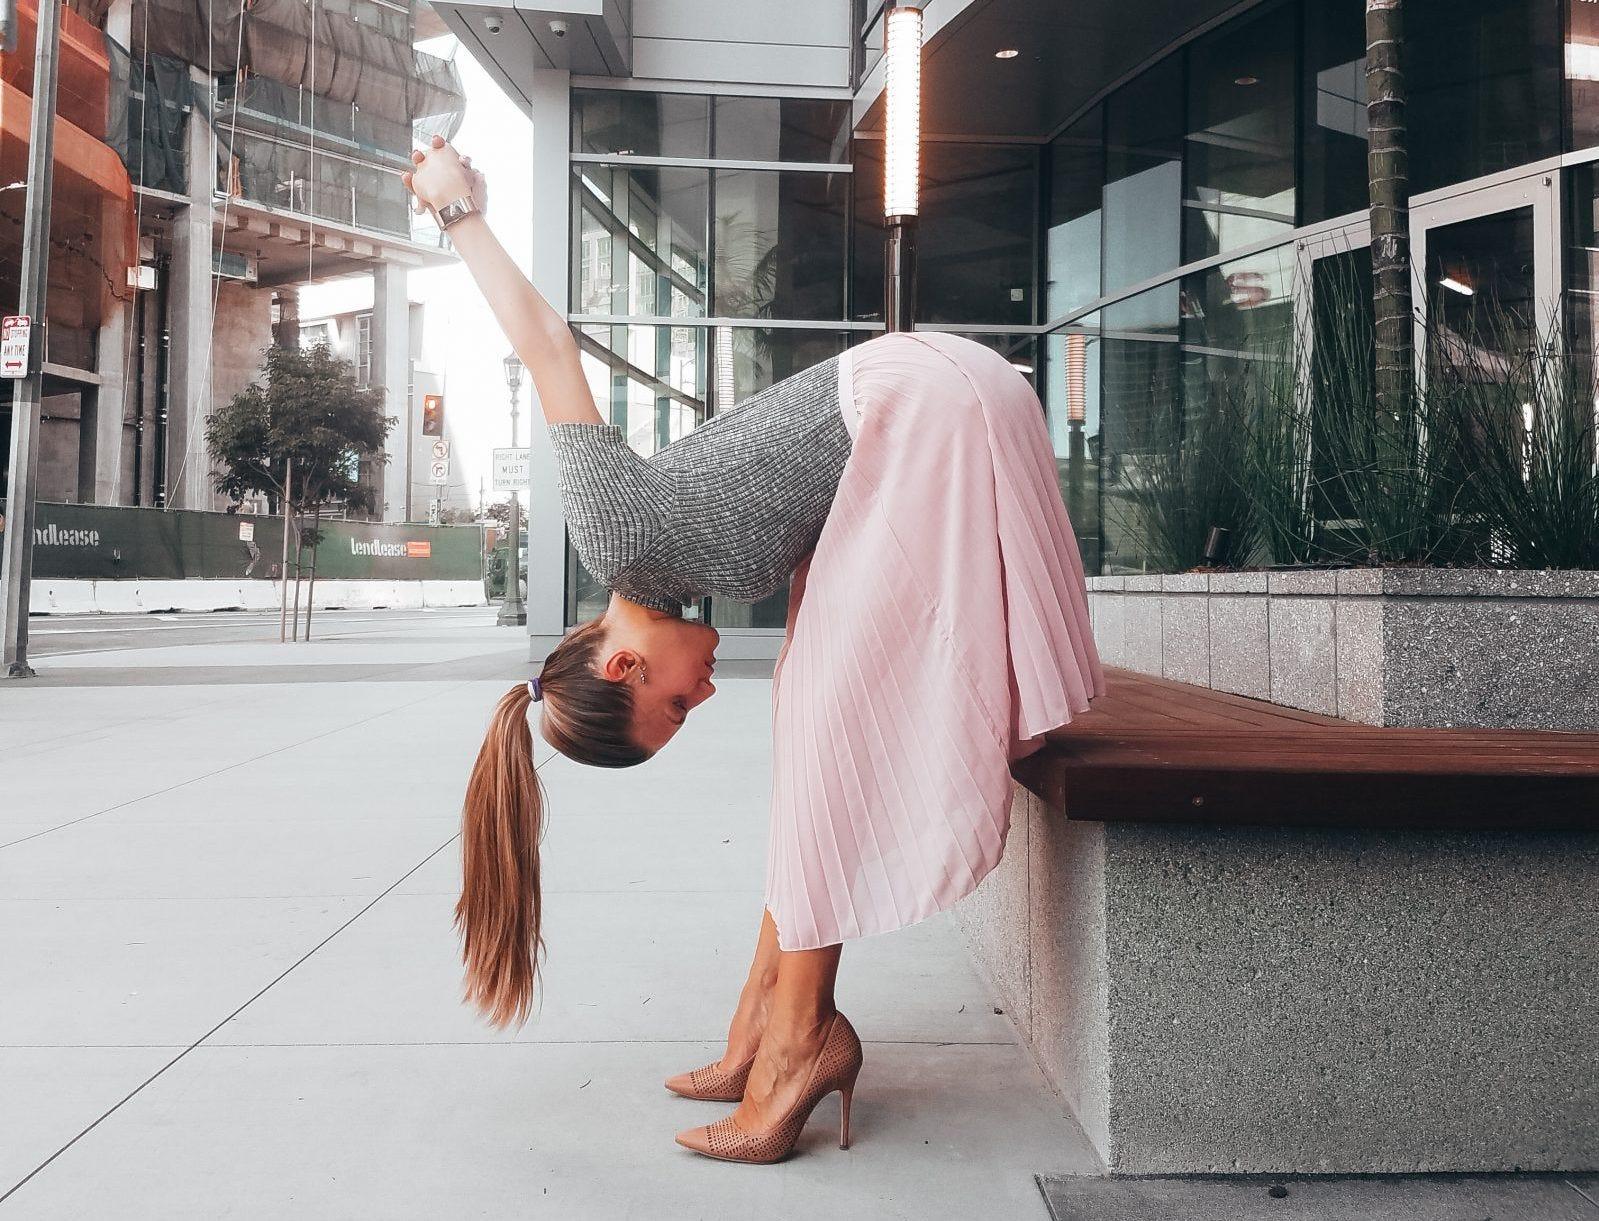 a young woman does a forward fold yoga stretch